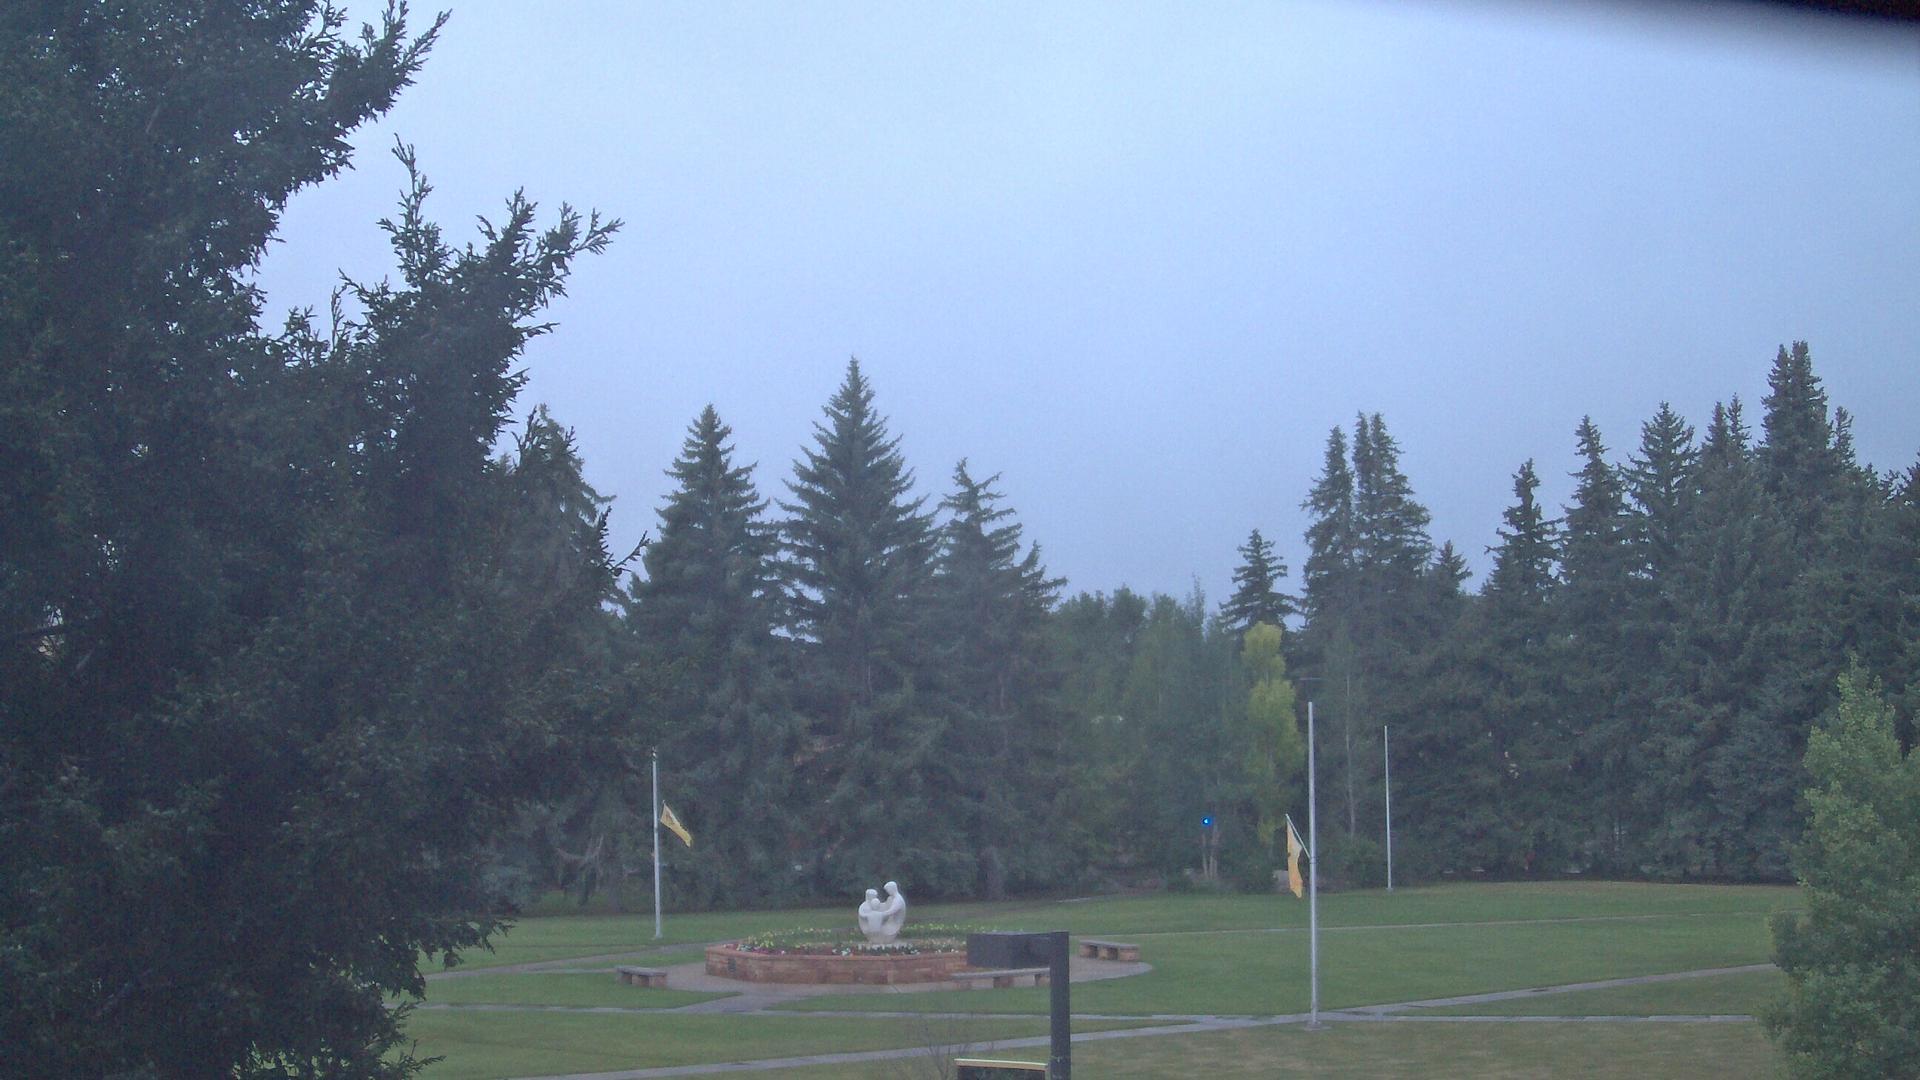 Webcam West Laramie: Laramie − University of